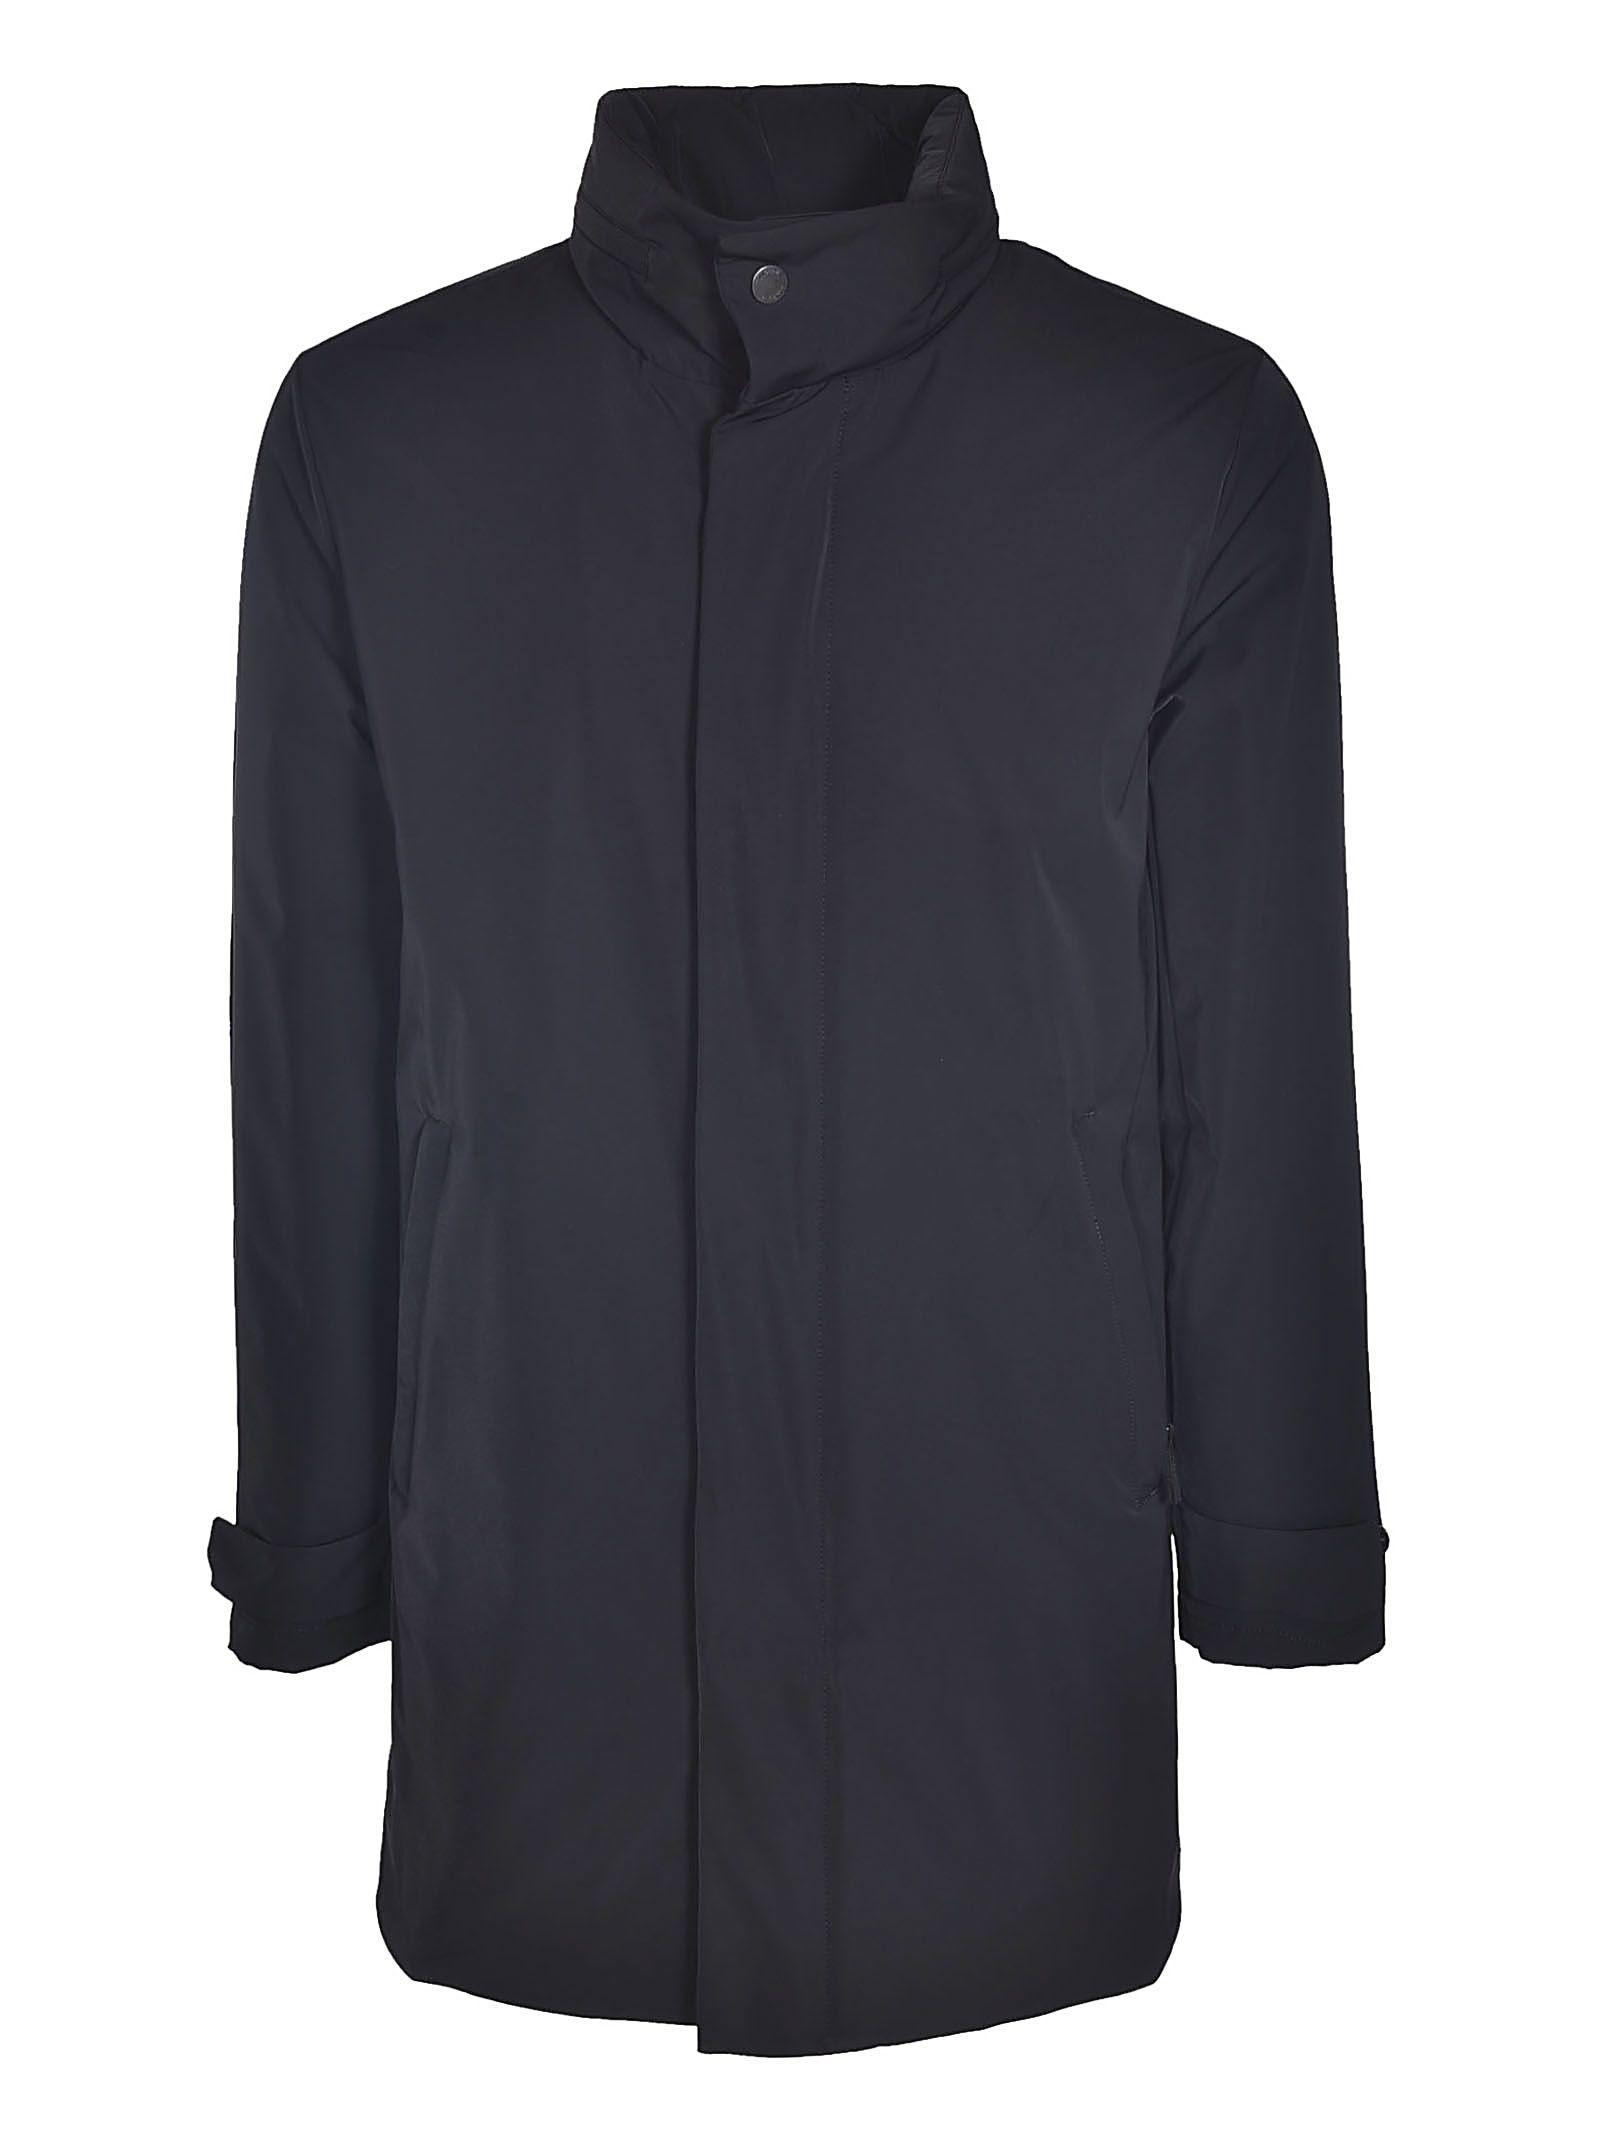 ALLEGRI Zipped Coat in Black